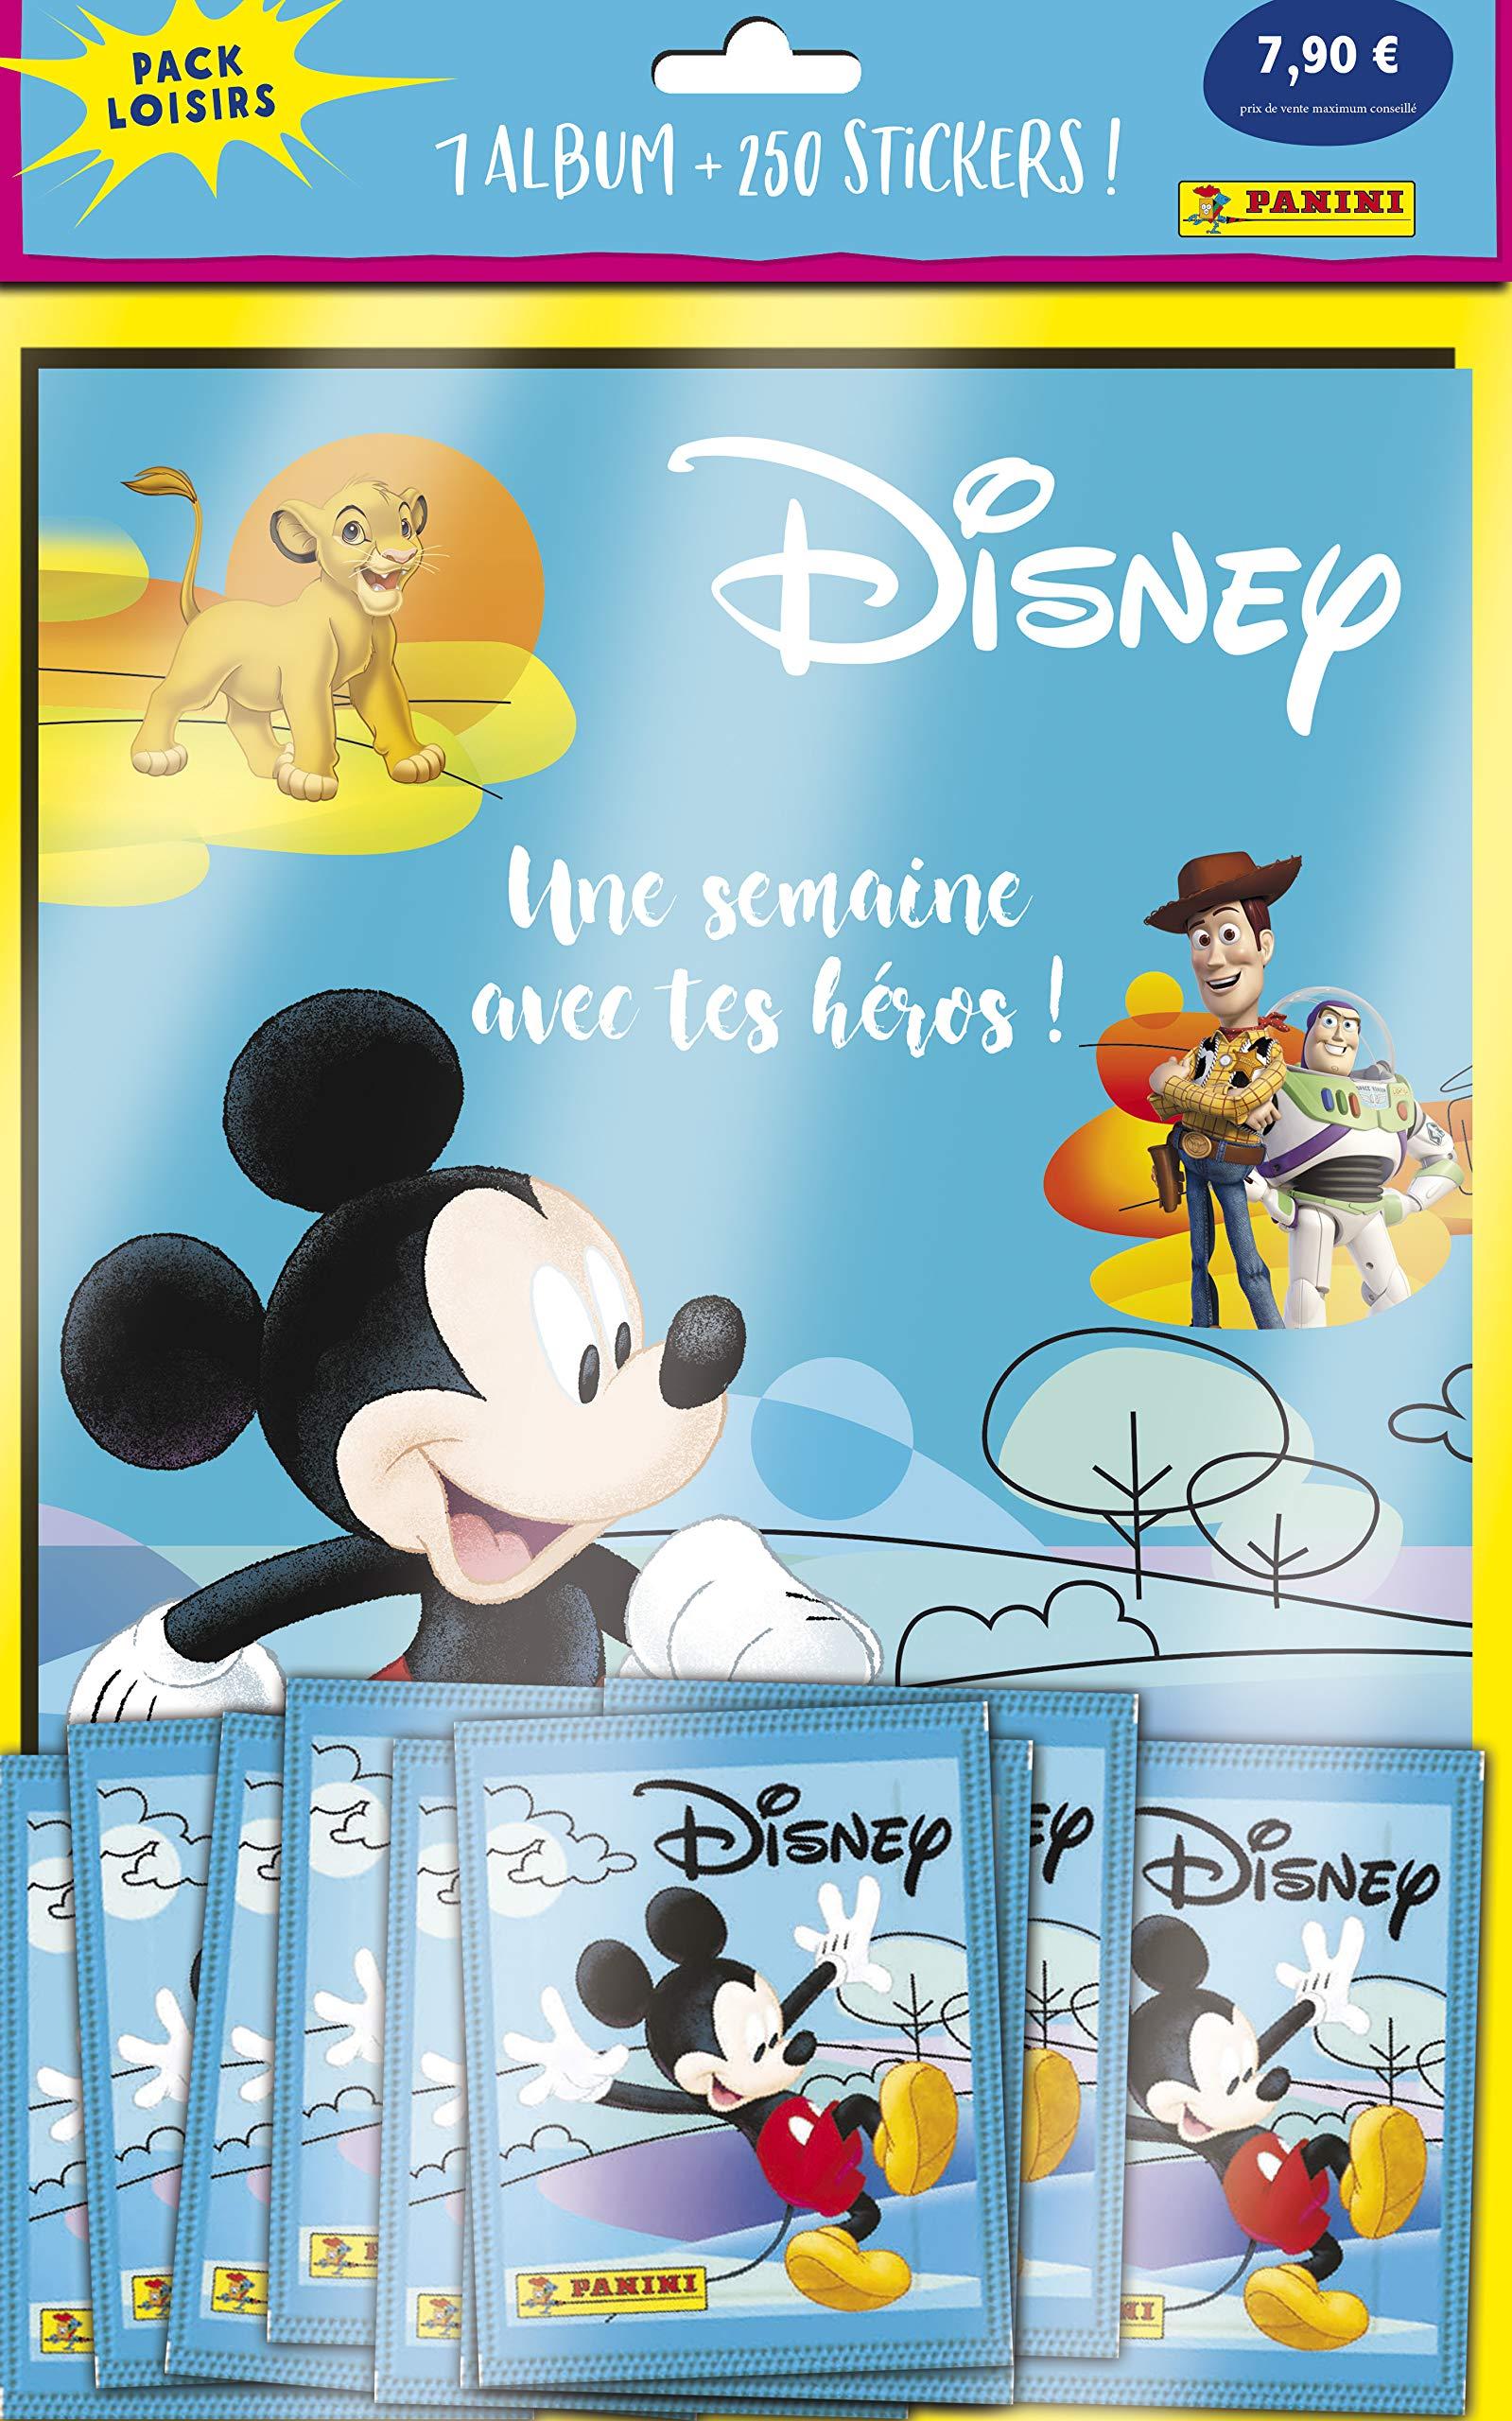 Panini France SA-Pack de ocios 2020-DISNEY PIXAR, 2413-006 , color ...